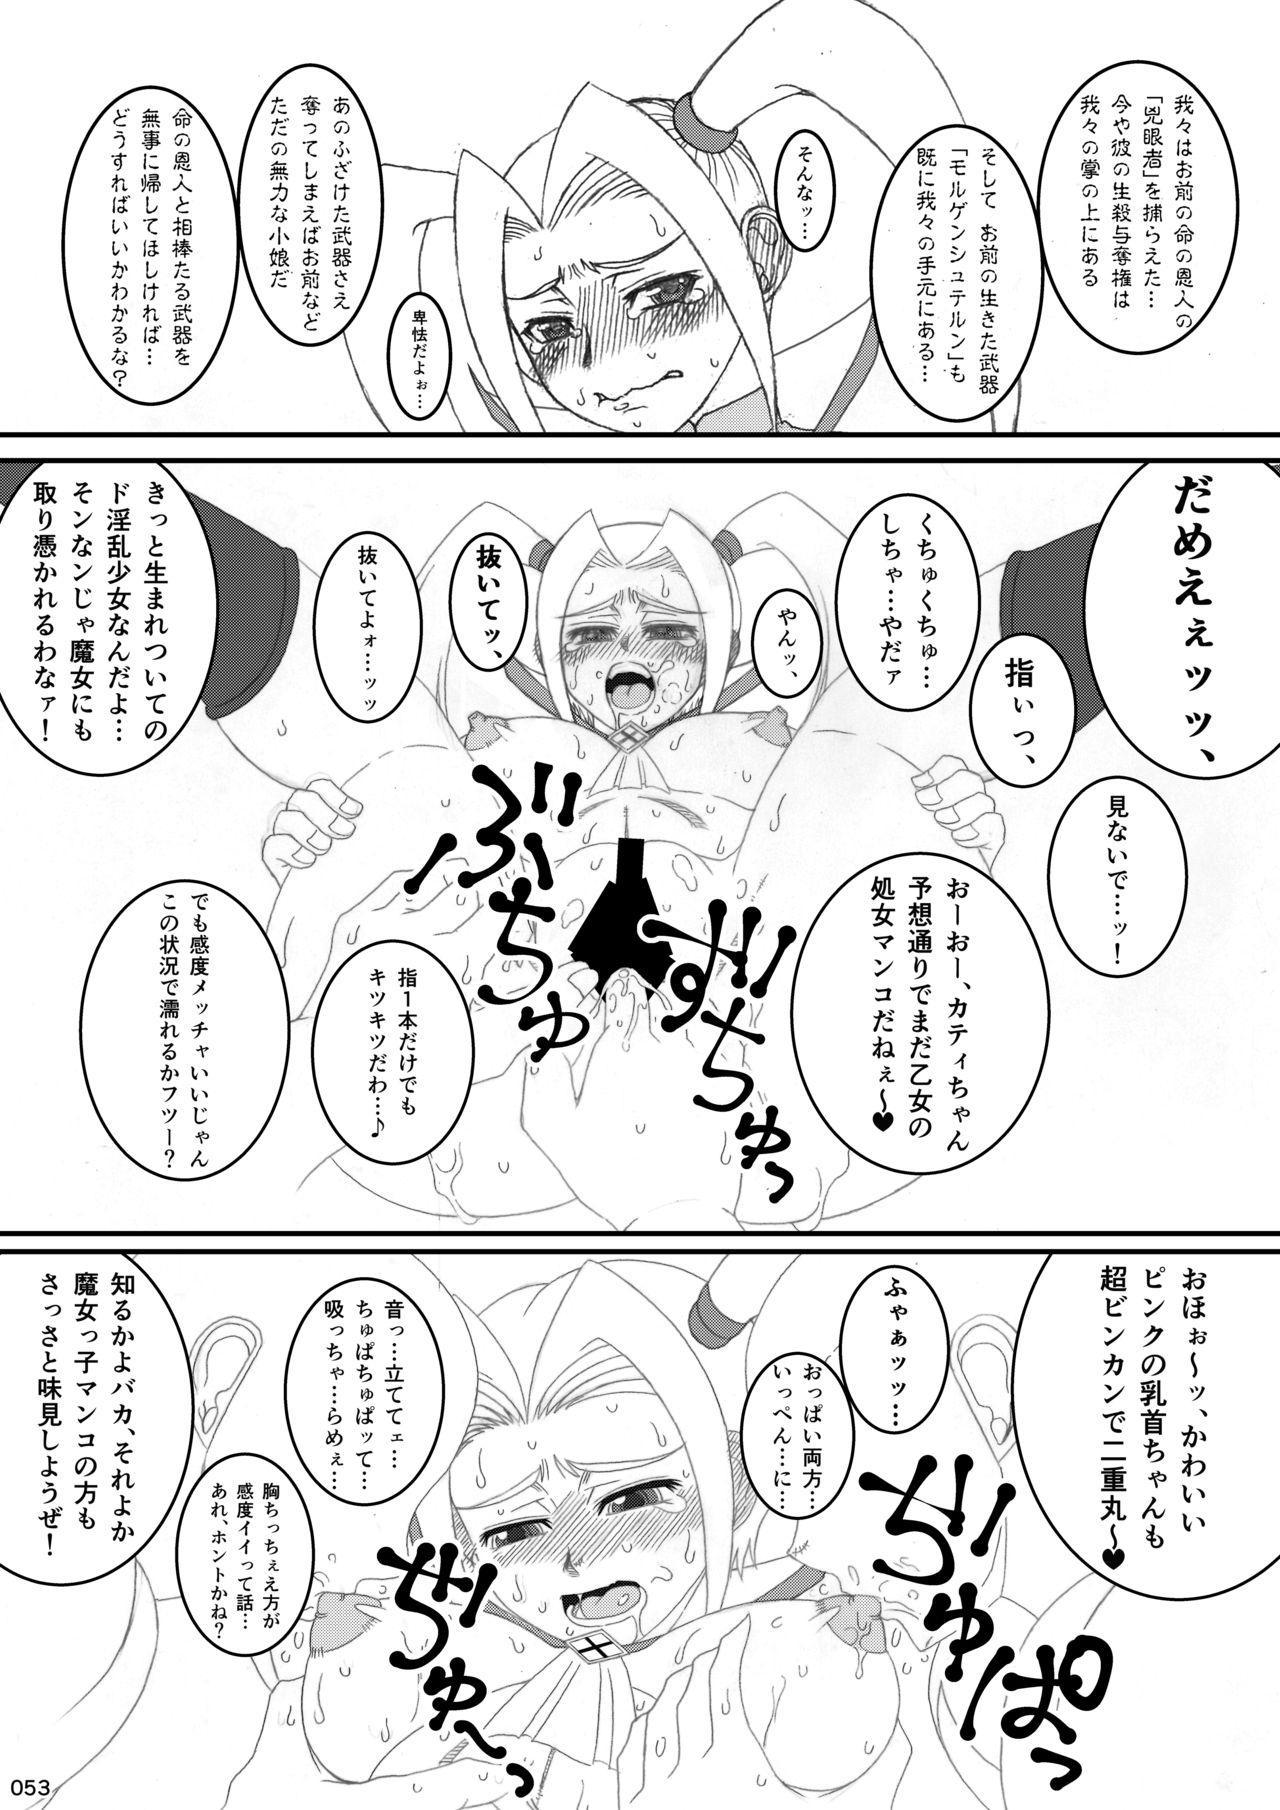 Akatsuki Blitzkampf & EN-1 Perfekt Welt Gangbang Anthology 52